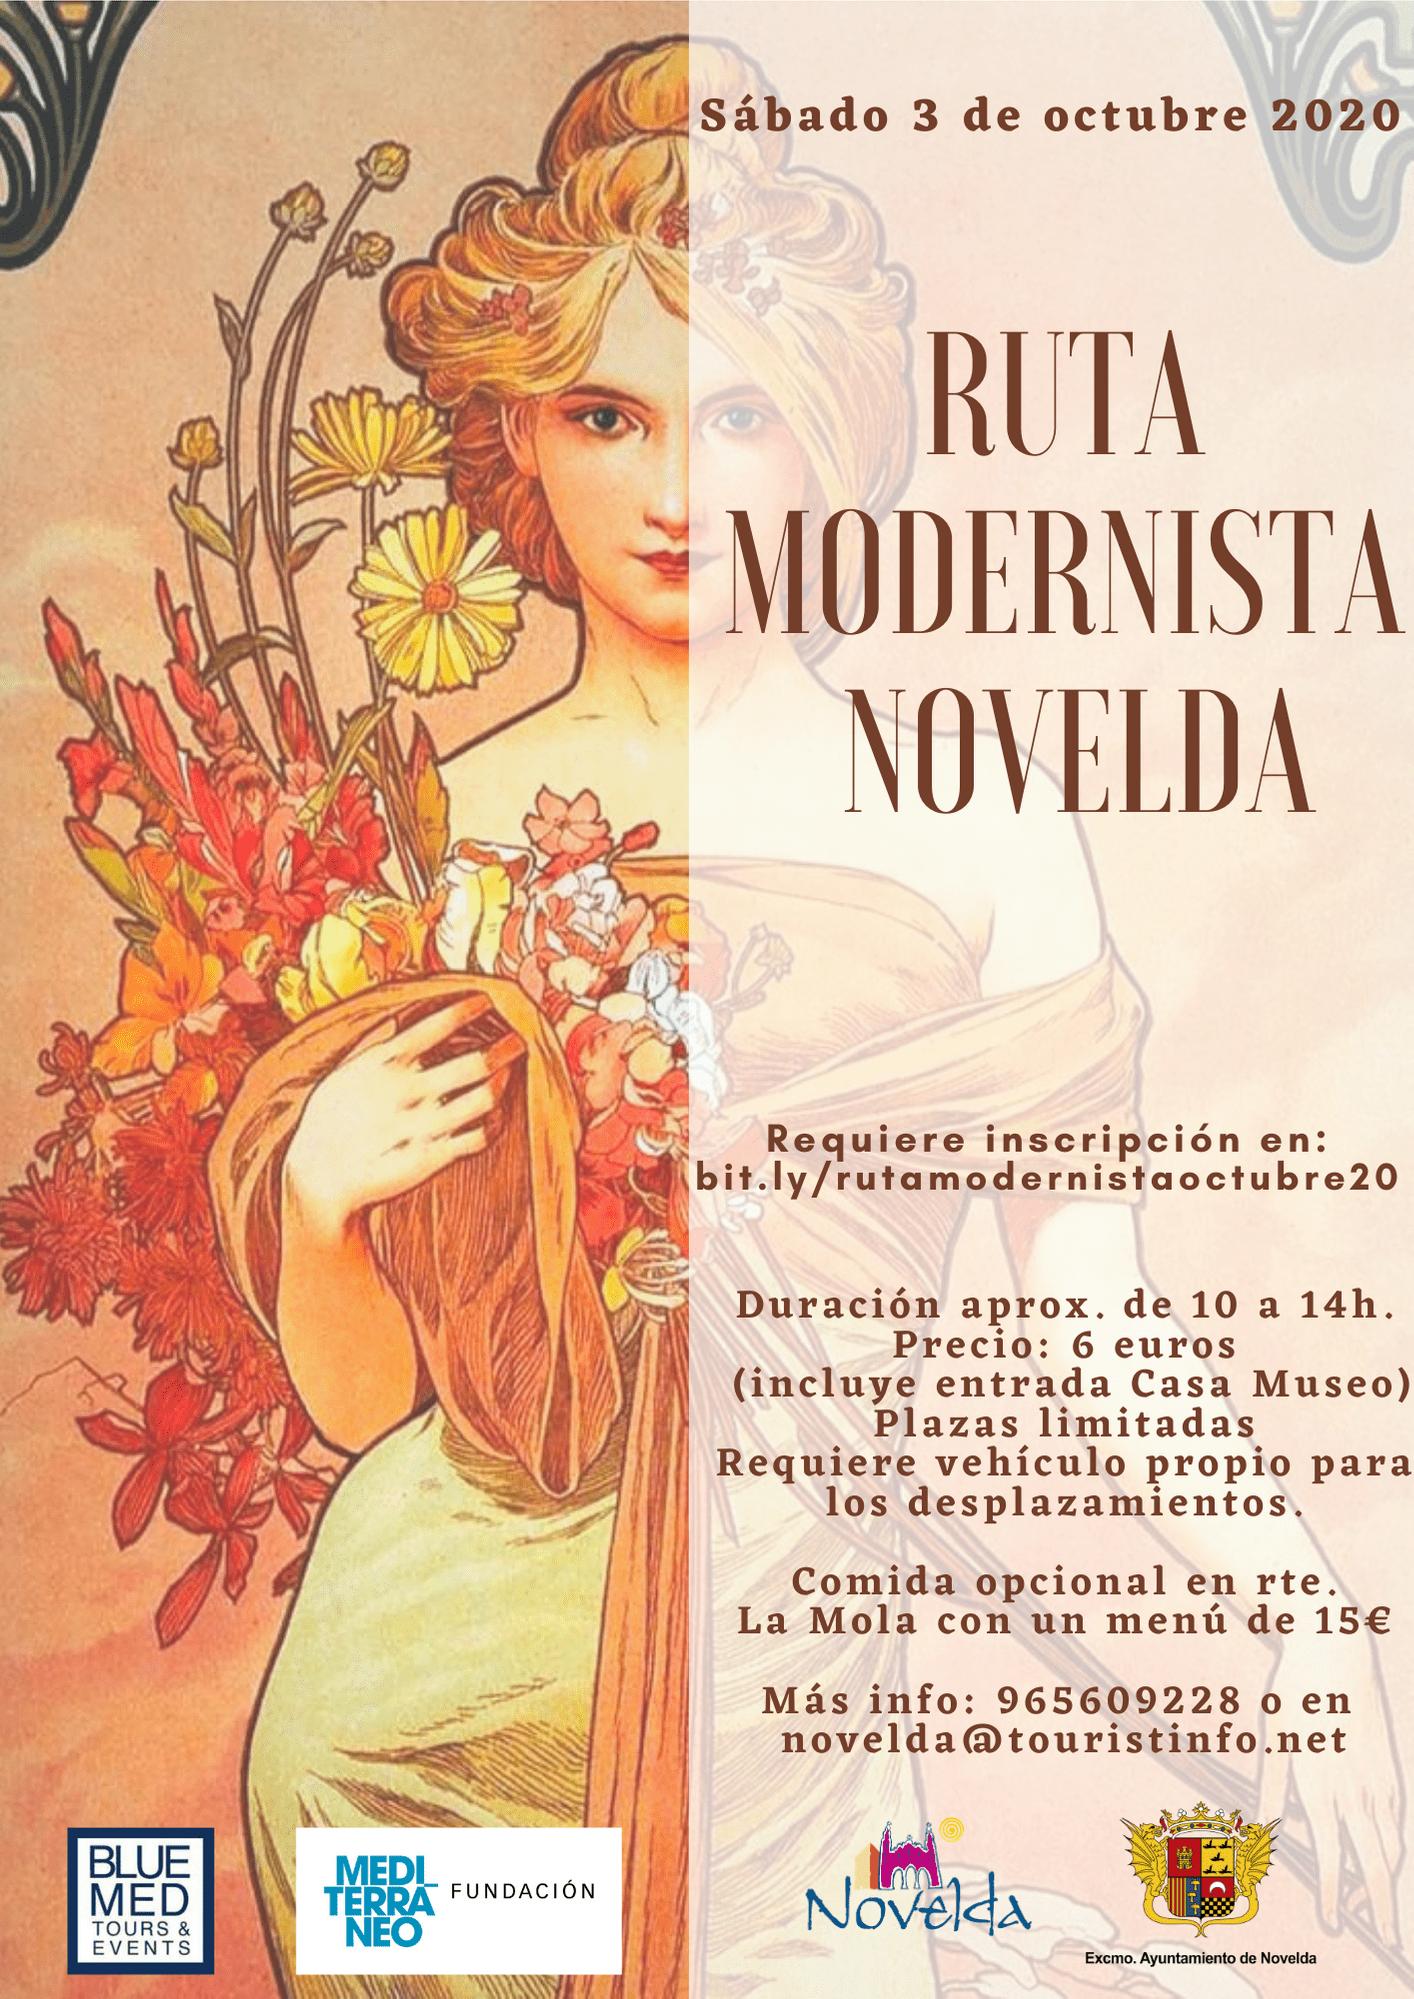 Ayuntamiento de Novelda ruta-modernista-octubre-20 Ruta Modernista Novelda